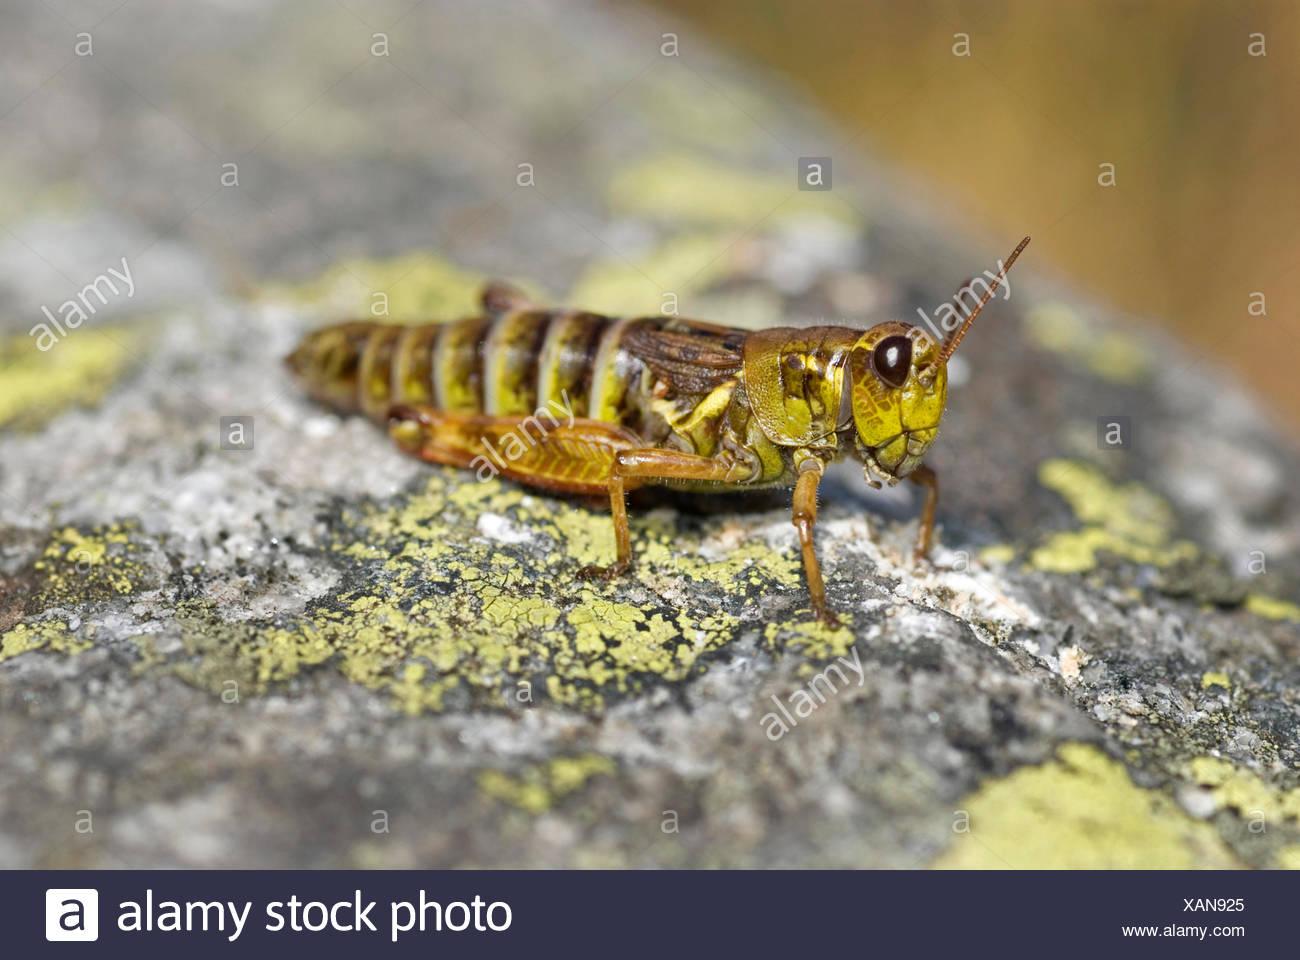 Northern migratory grasshopper (Melanoplus frigidus, Bohemanella frigida), sitting on a rock, Switzerland - Stock Image